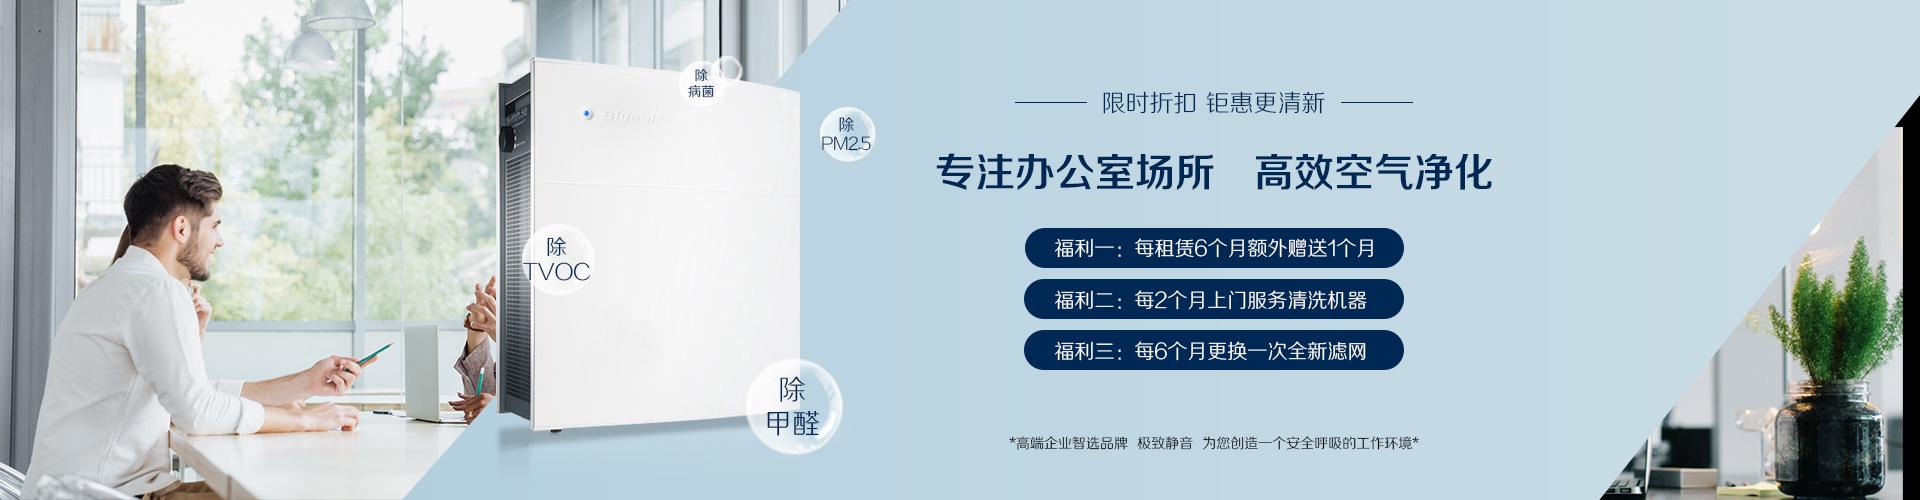 blueair租赁折扣,400-112-0098